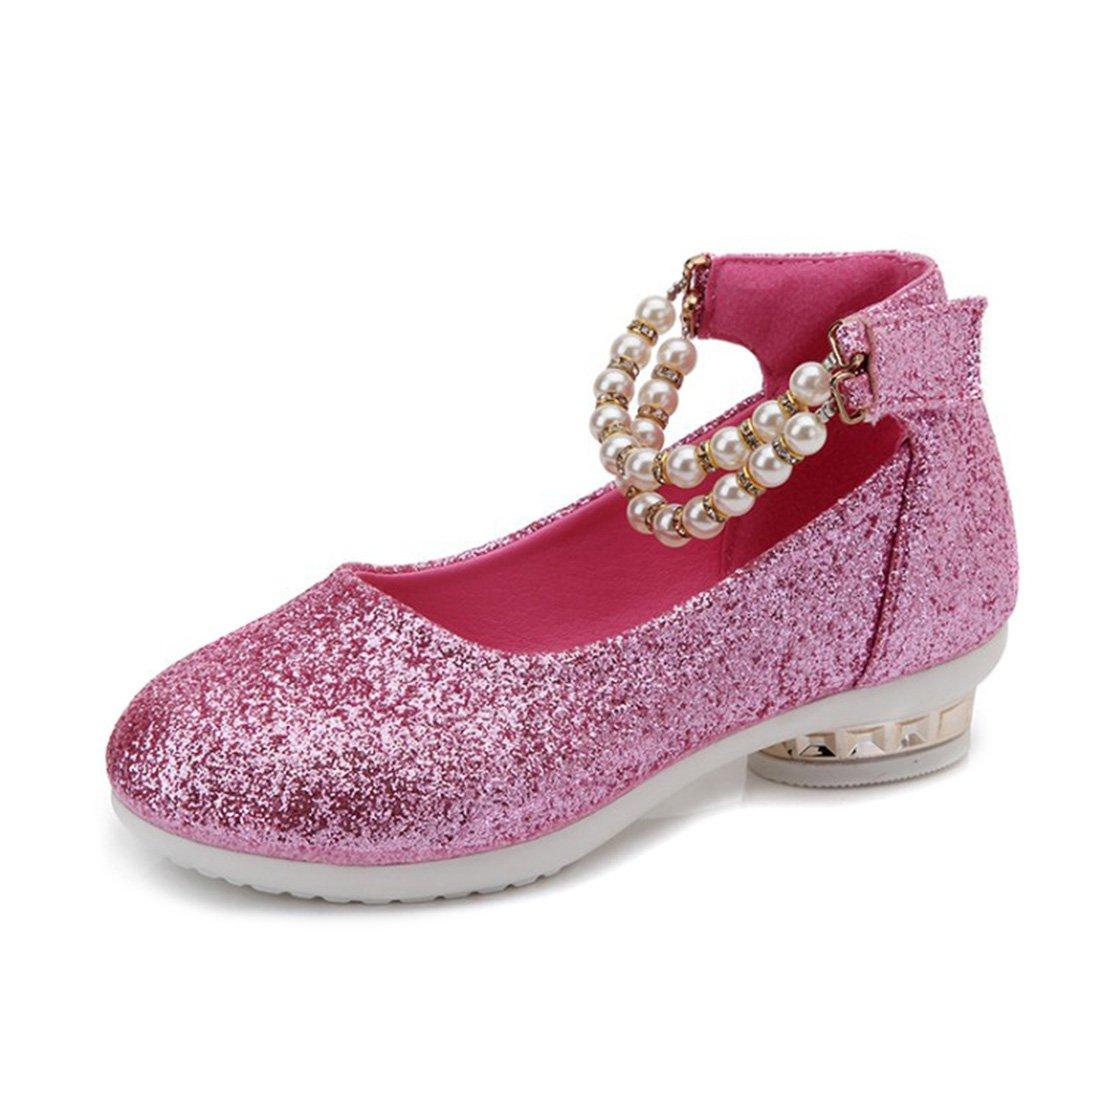 YIBLBOX Girls Kids Toddler Dress up Cosplay Princess Wedding Shoes Mary Jane Low Heel Shoes for Girls